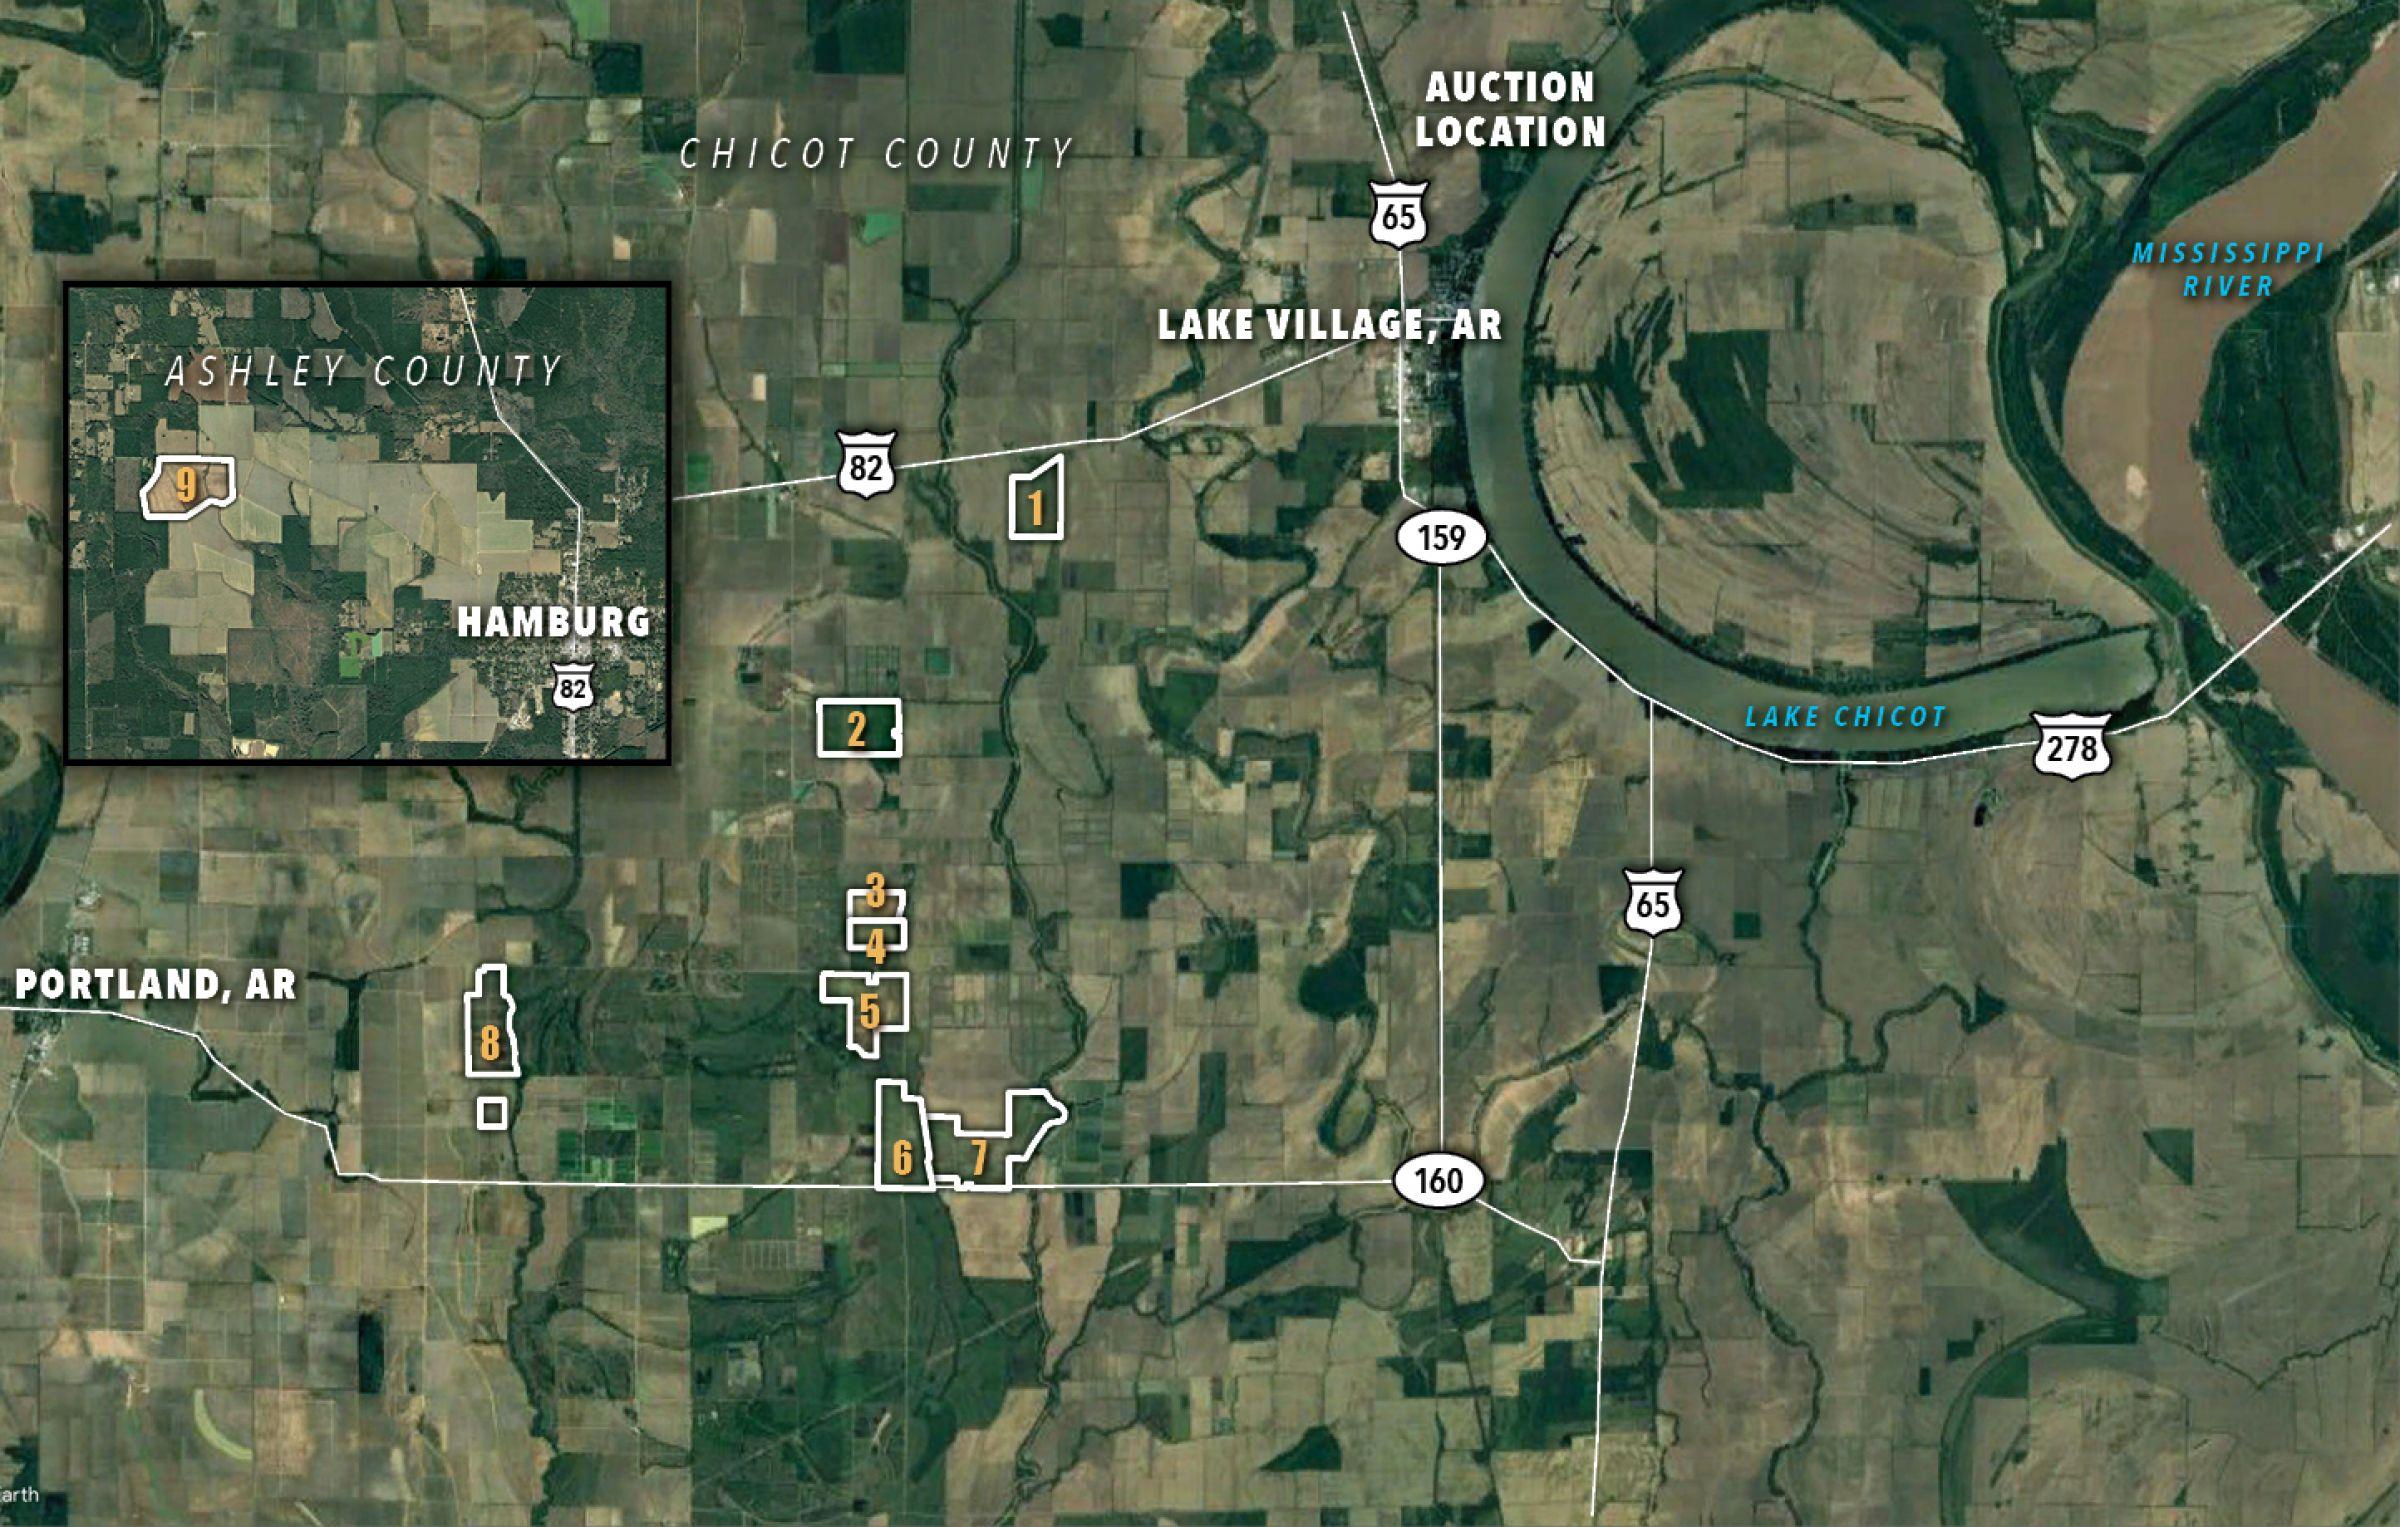 7-jennie-cutoff-road-lake-village-71653-0-2021-06-09-200404.jpg